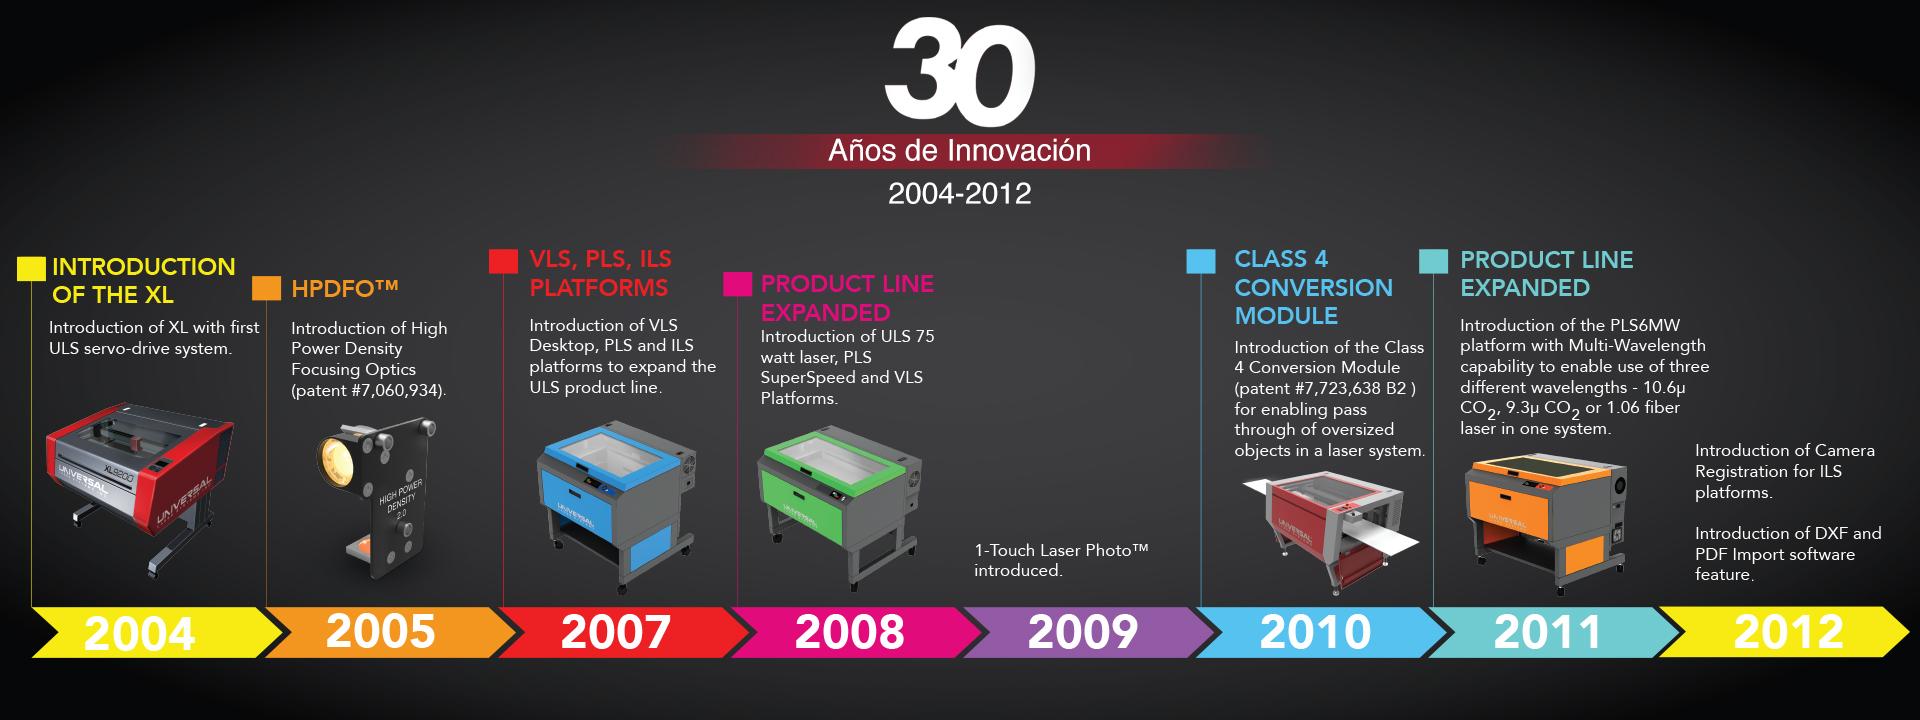 ULS Spanish Timeline 3